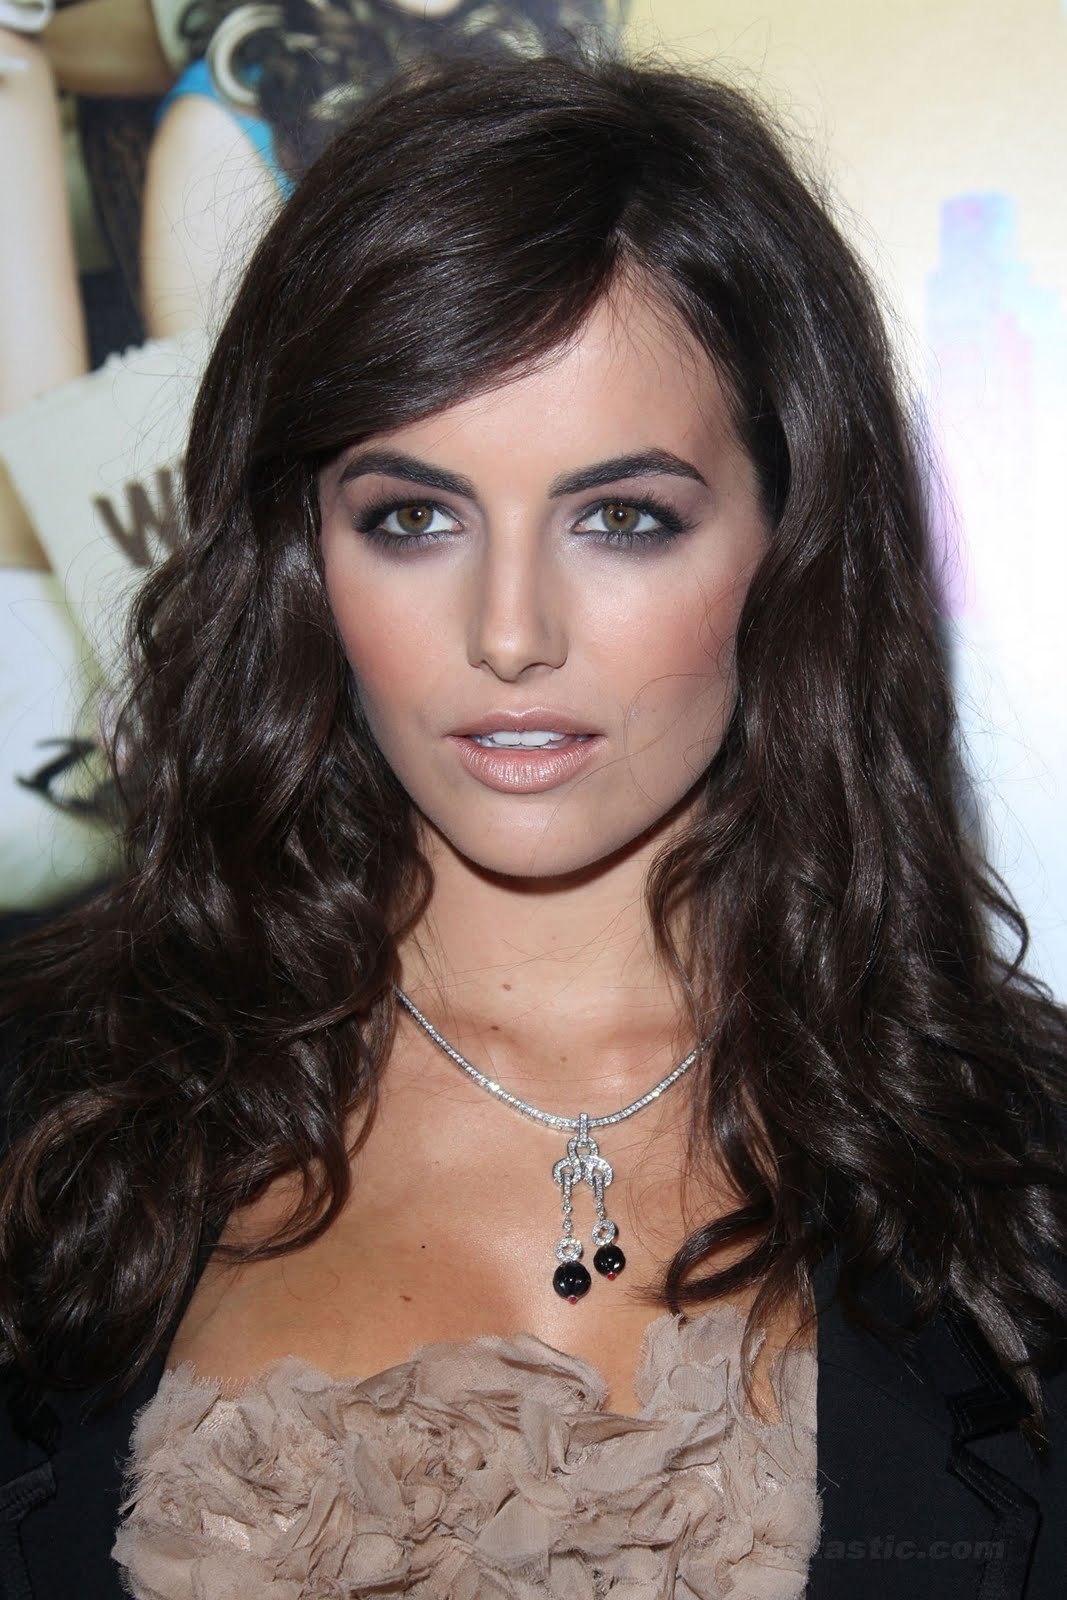 http://4.bp.blogspot.com/_rN9kcqp7pEI/TTdx5JtOFnI/AAAAAAAAAGI/i6f3r-Fjfig/s1600/Camilla-Belle-sexy_justpeople_03.jpg